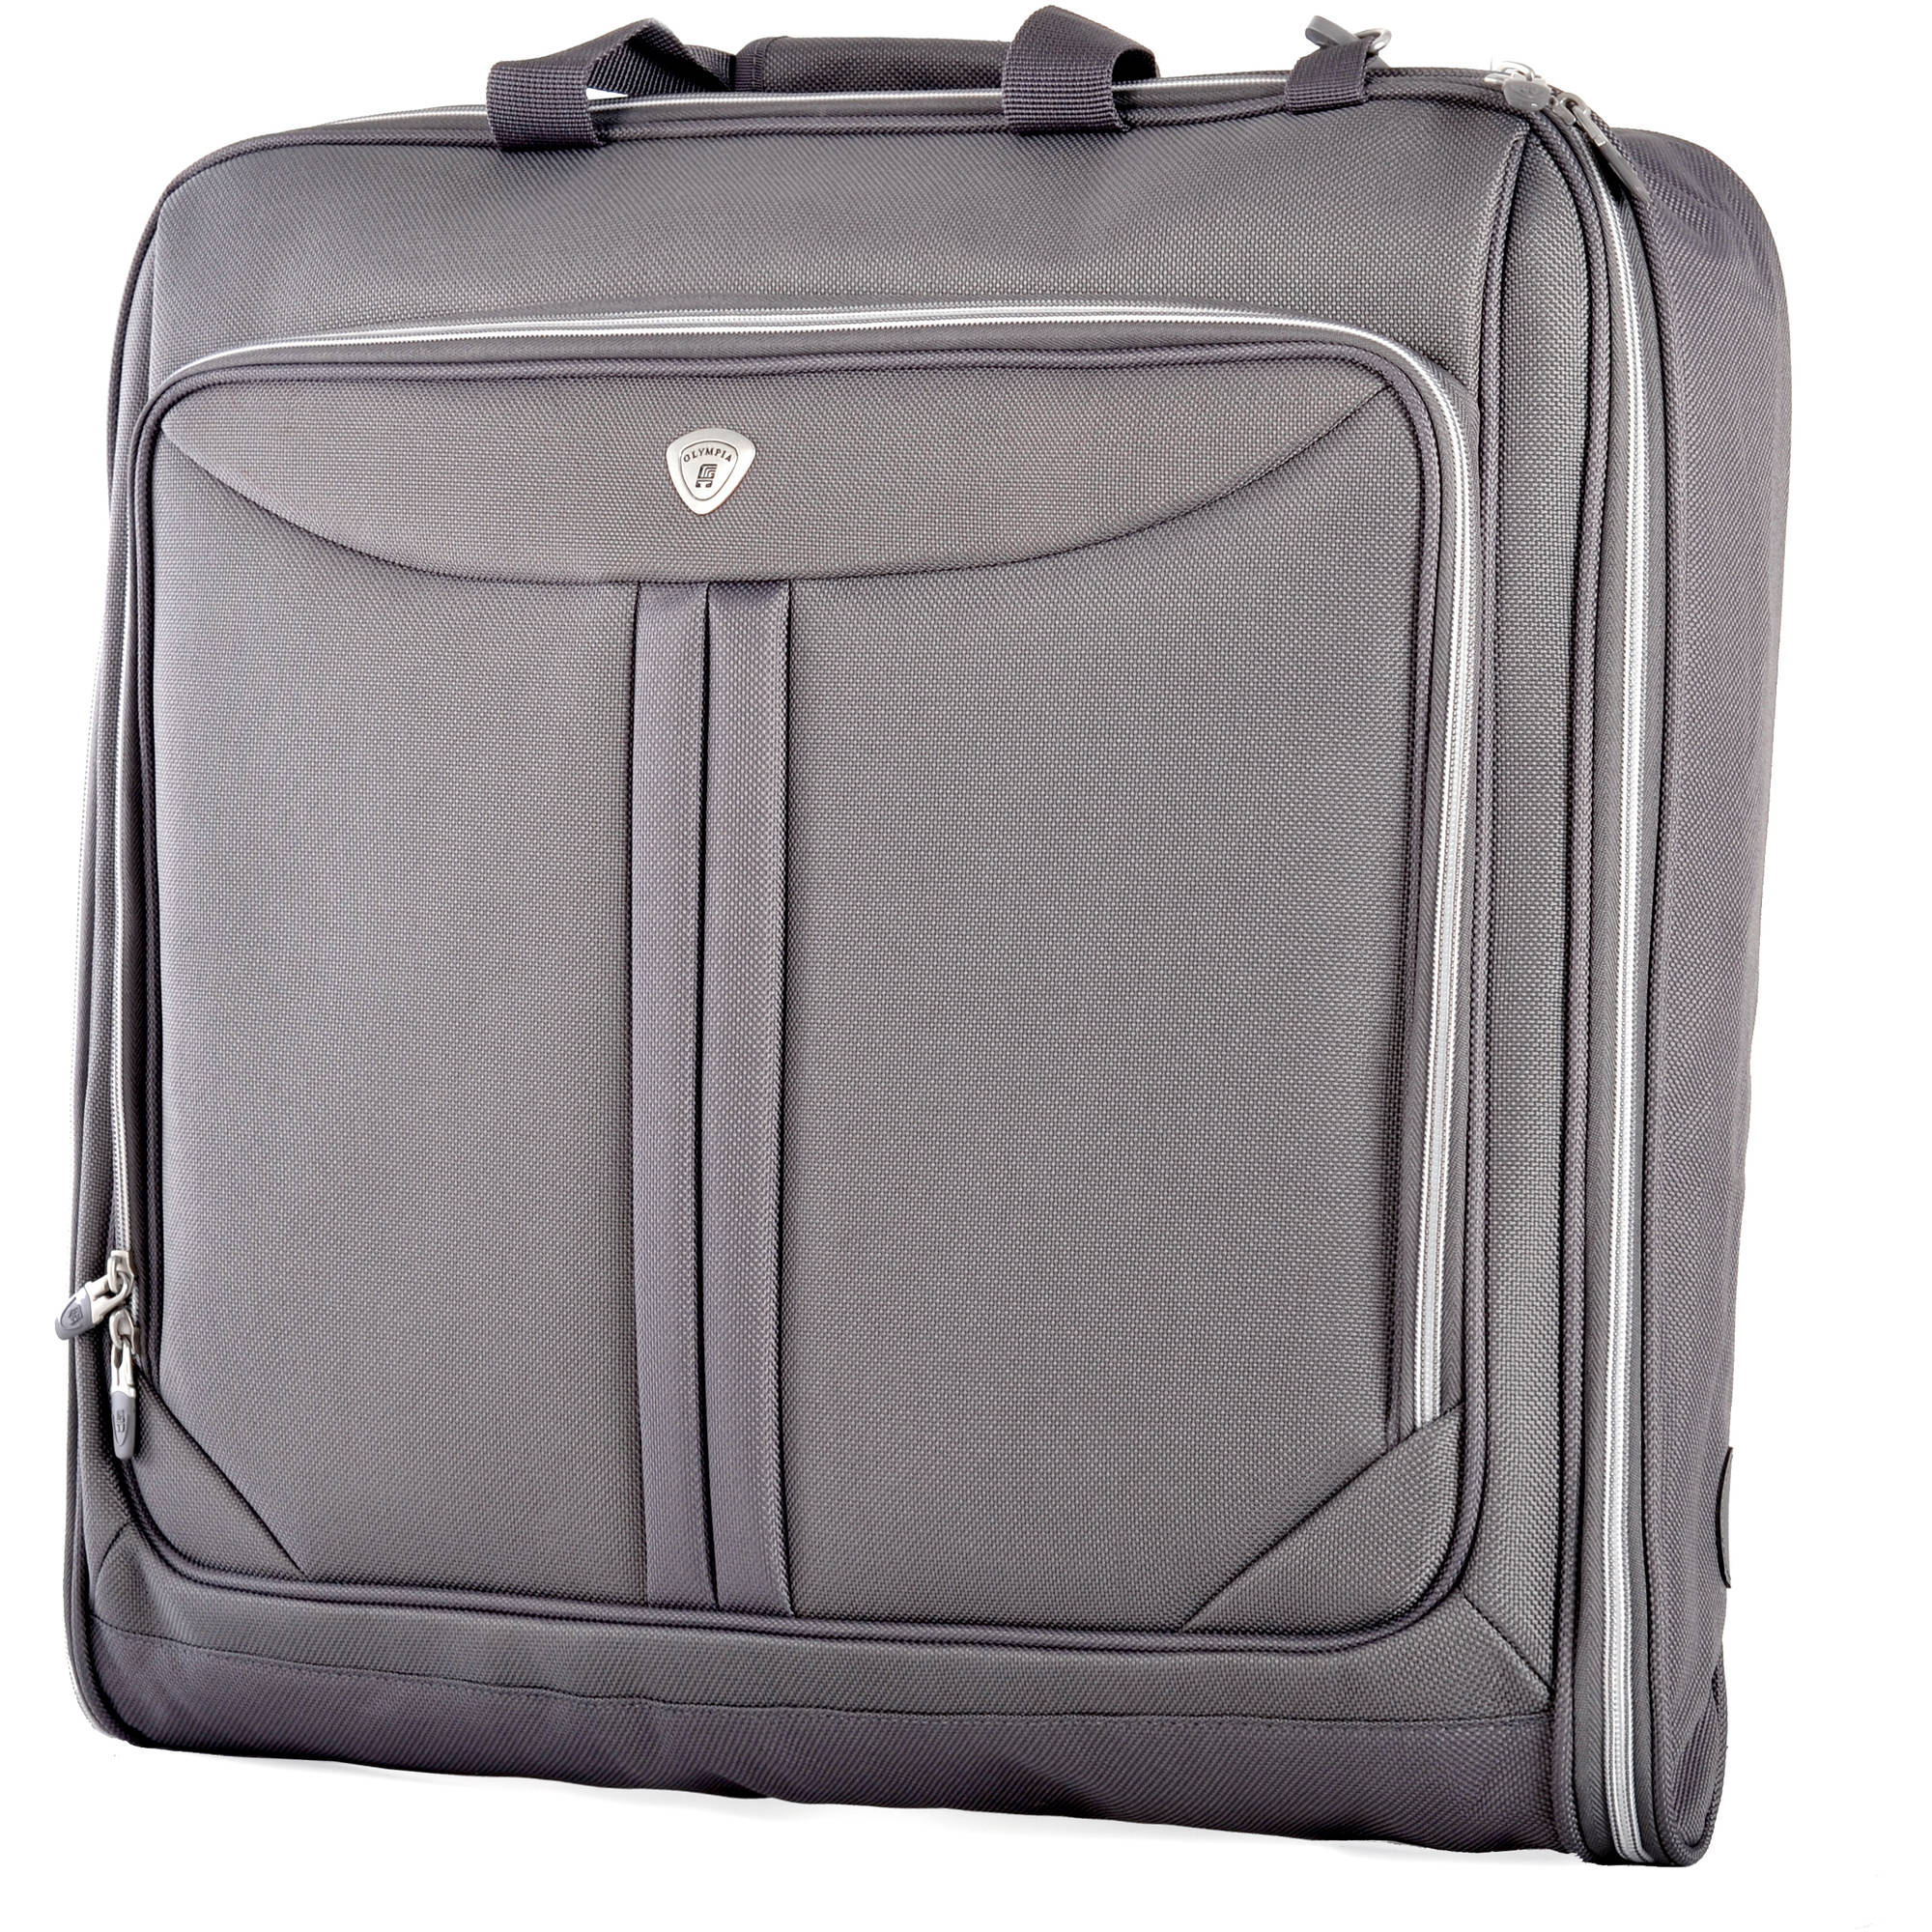 L leather travel u0026 garment bag natural code click 4 for Wedding dress garment bag for air travel